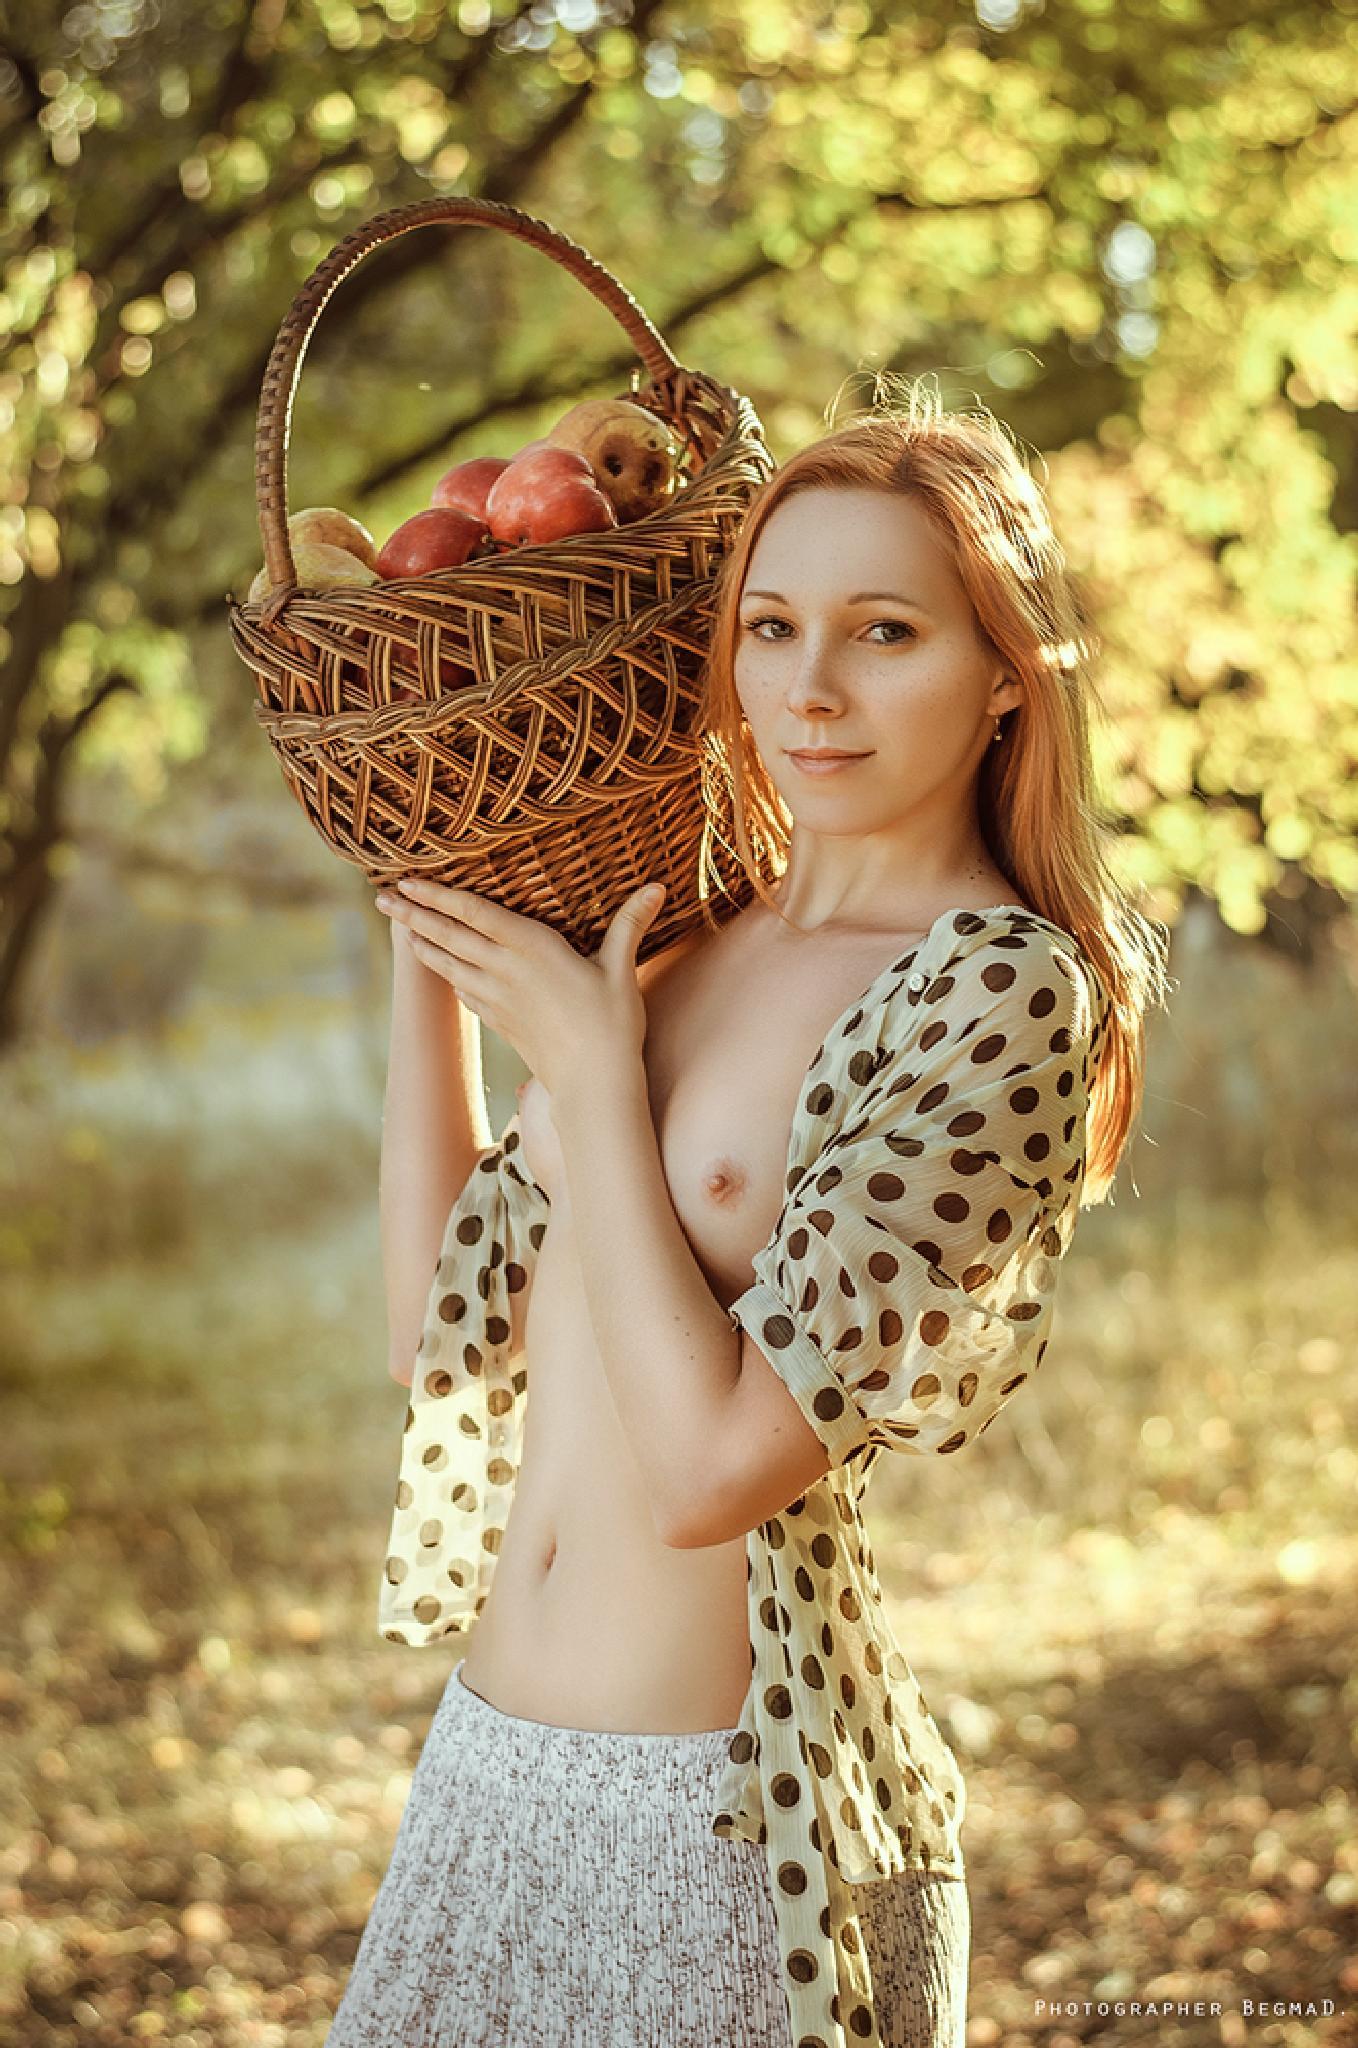 In the garden of paradise by Dima Begma (Дмитрий Бегма)